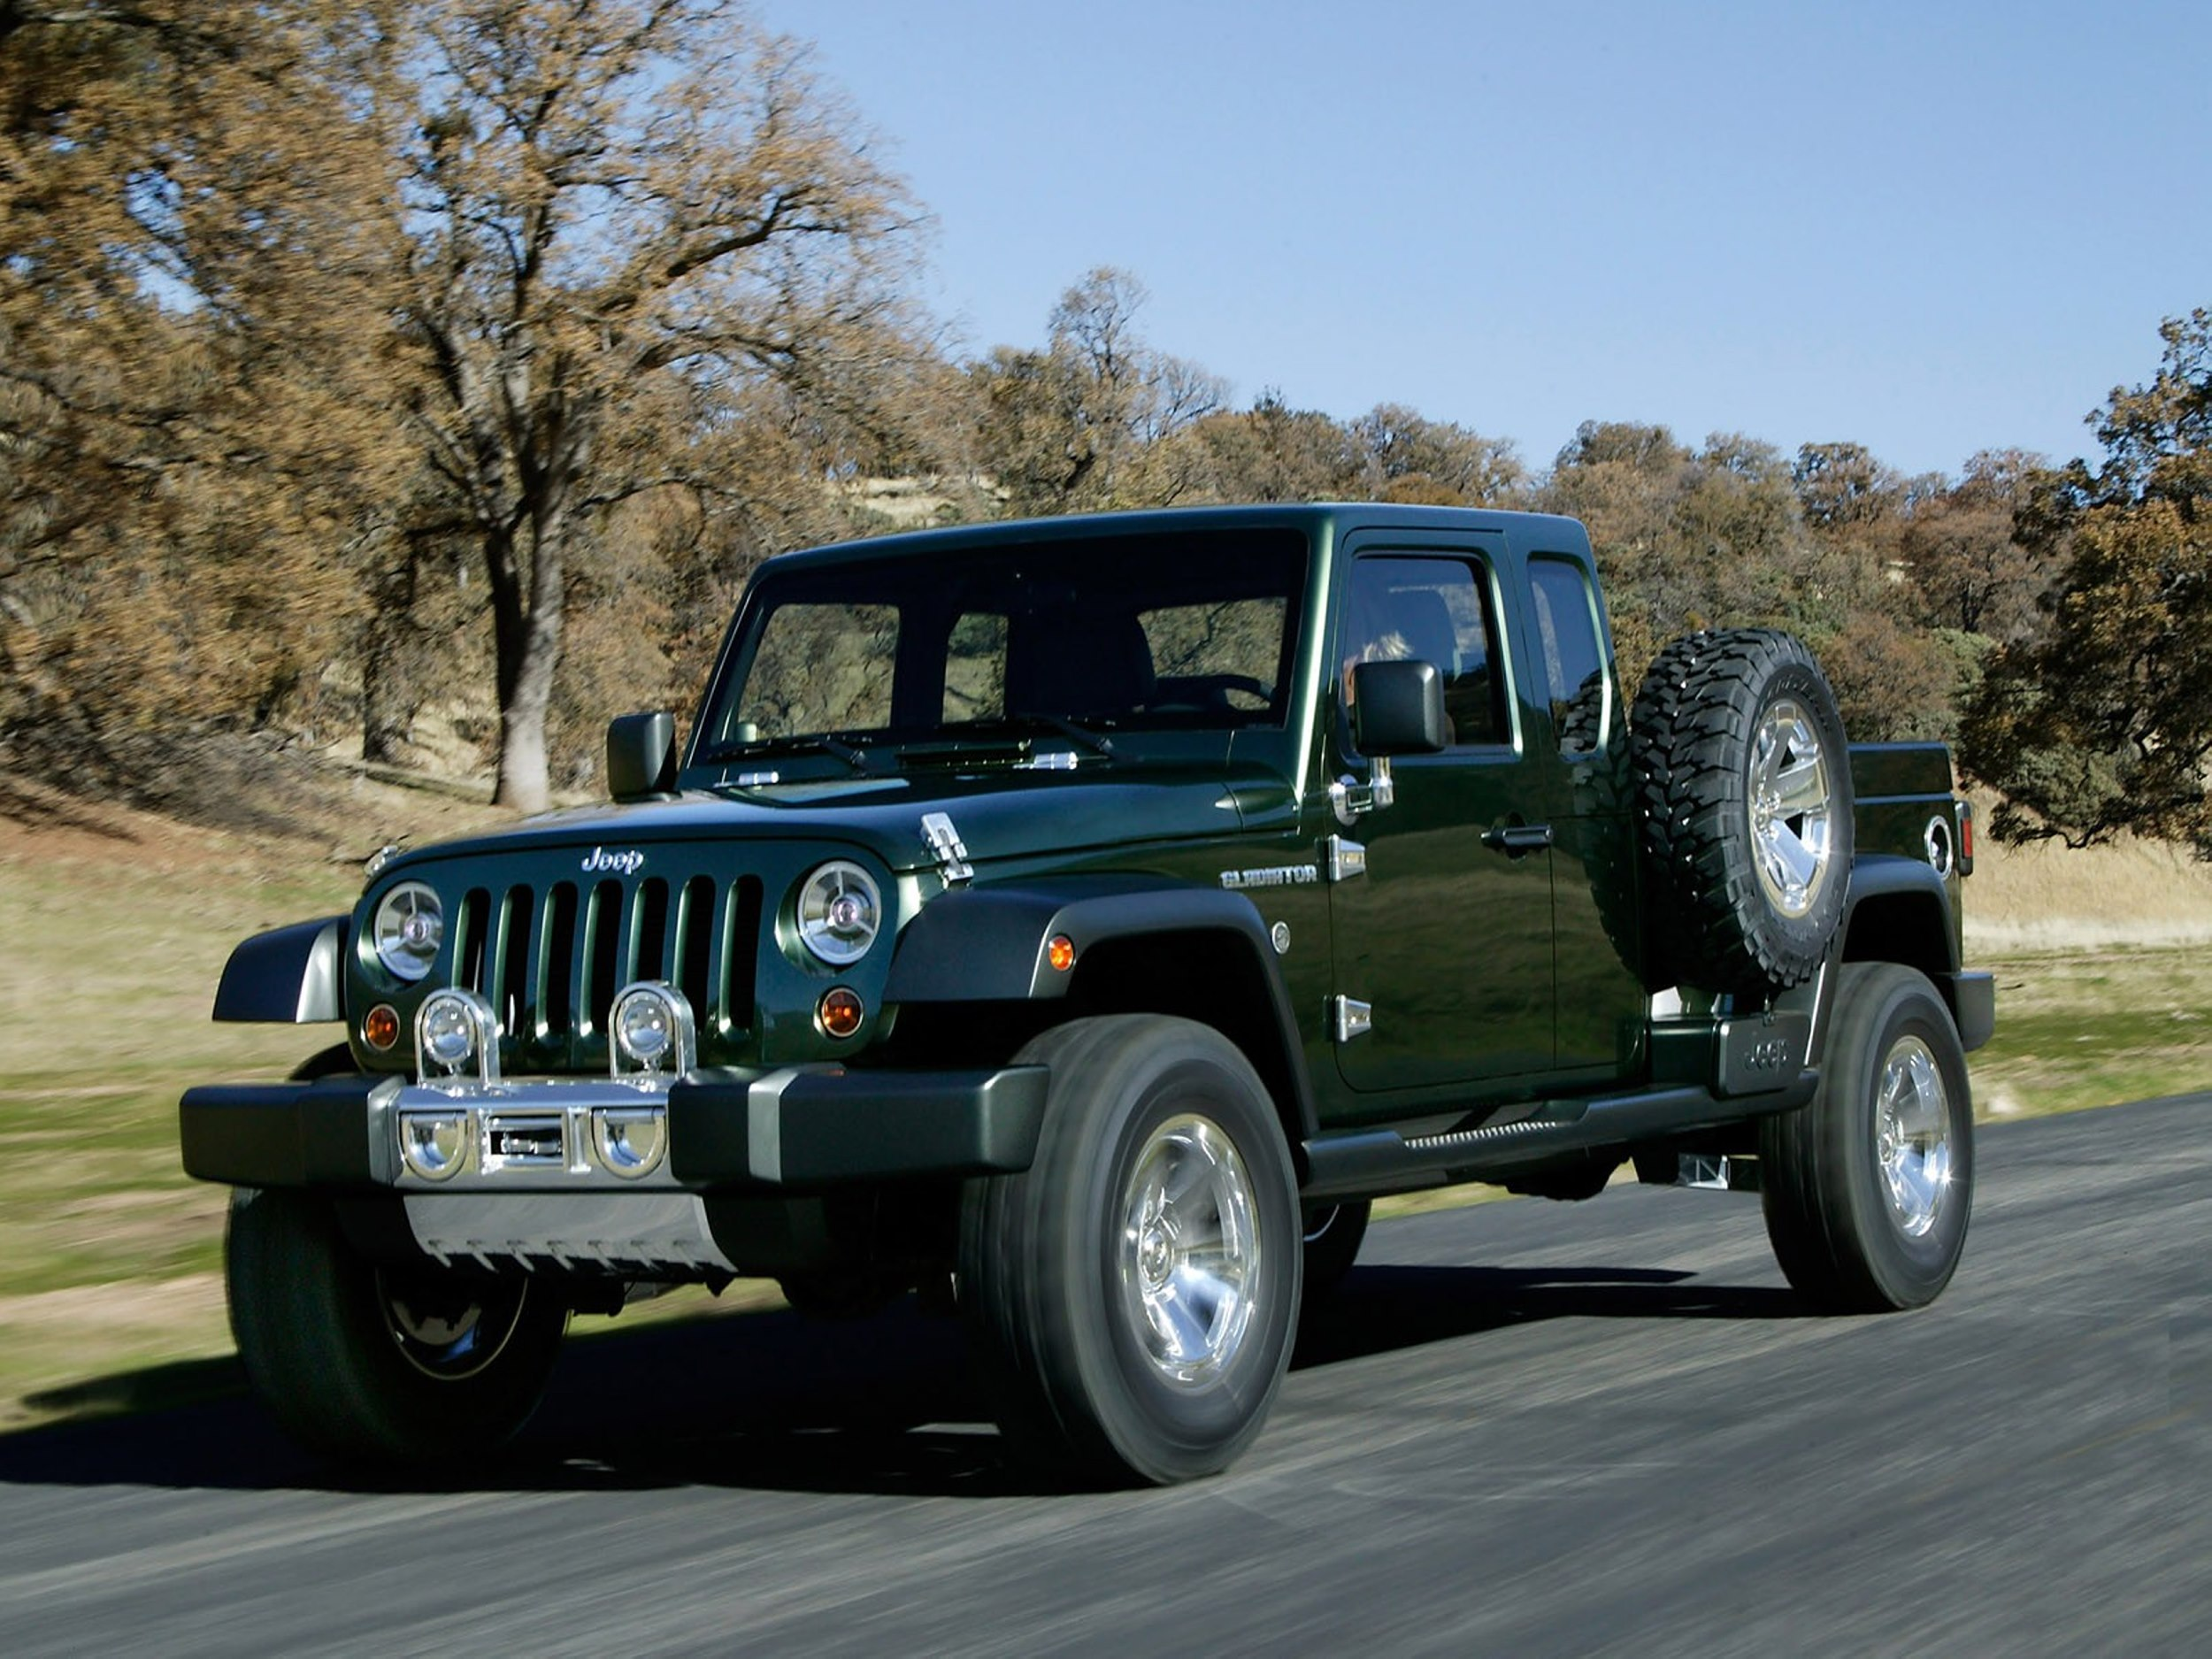 autowp.ru jeep gladiator concept 2.jpg jeep gladiator concept 2